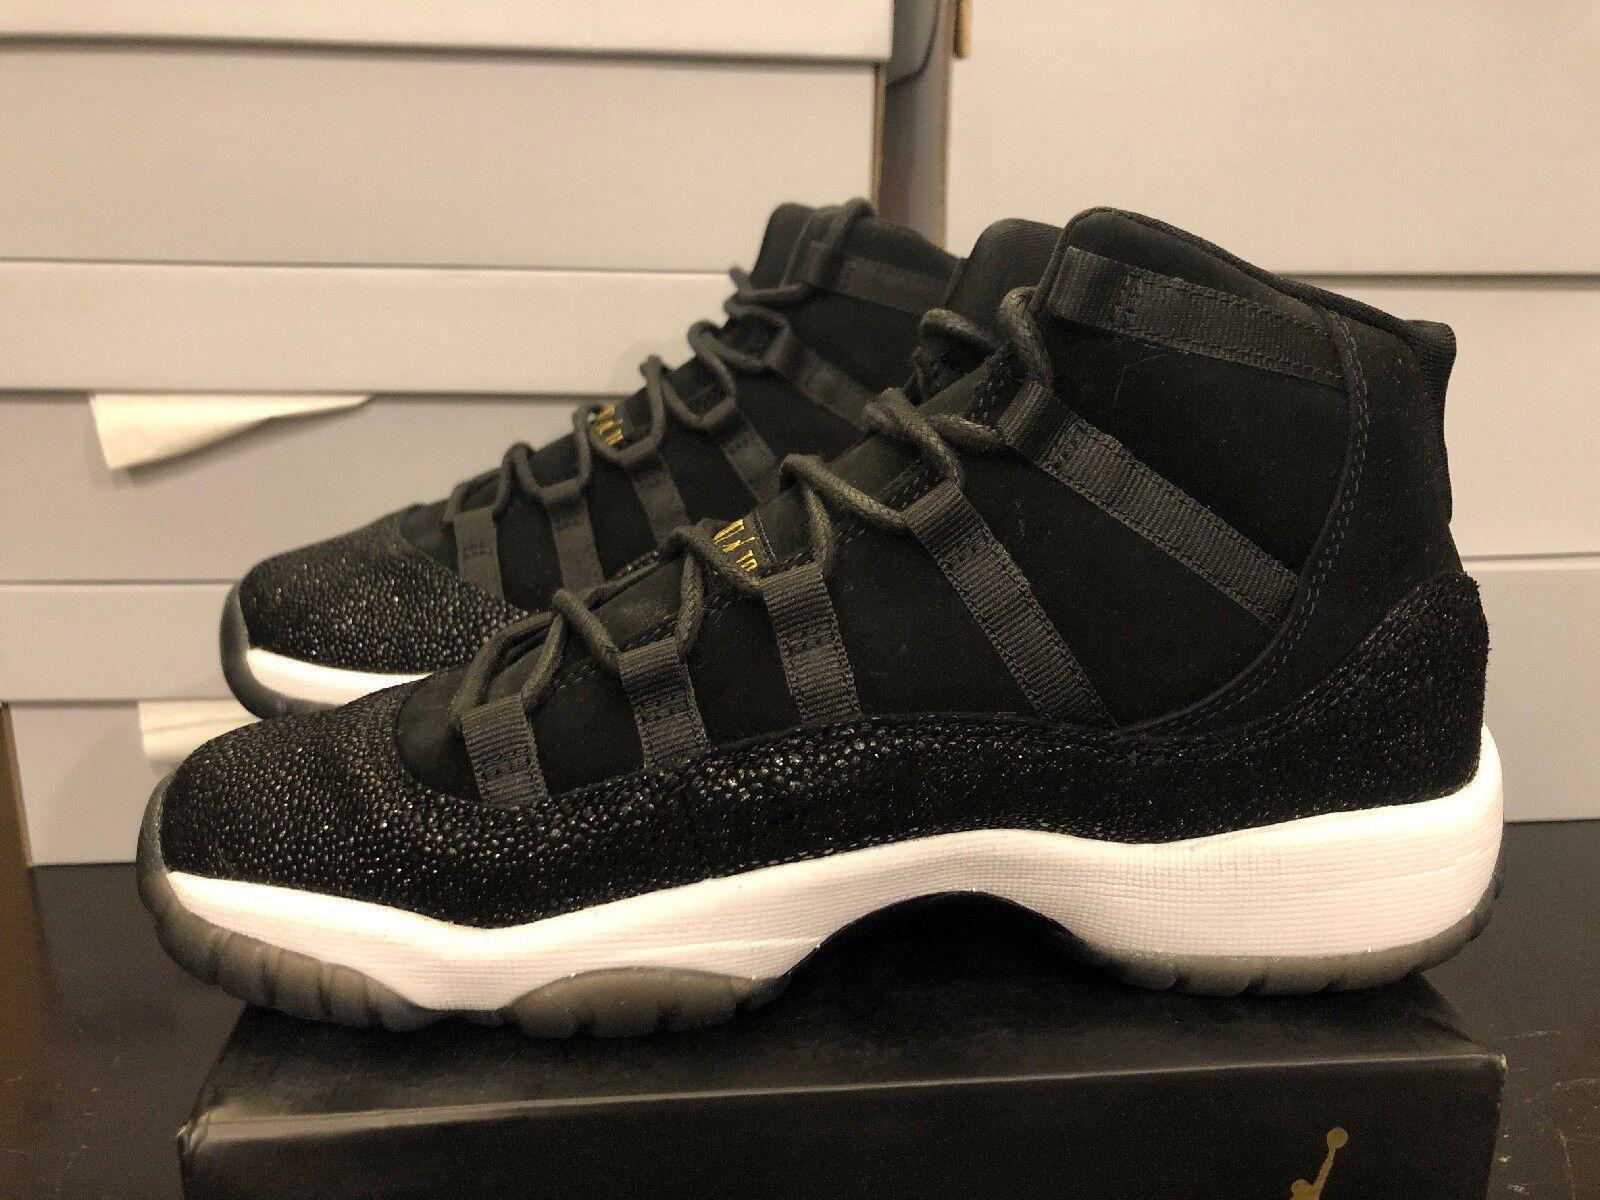 19bbe25fec3 Nike Air Jordan 11 Retro Premium HC Heiress Stingray 852625-030 Sz ...